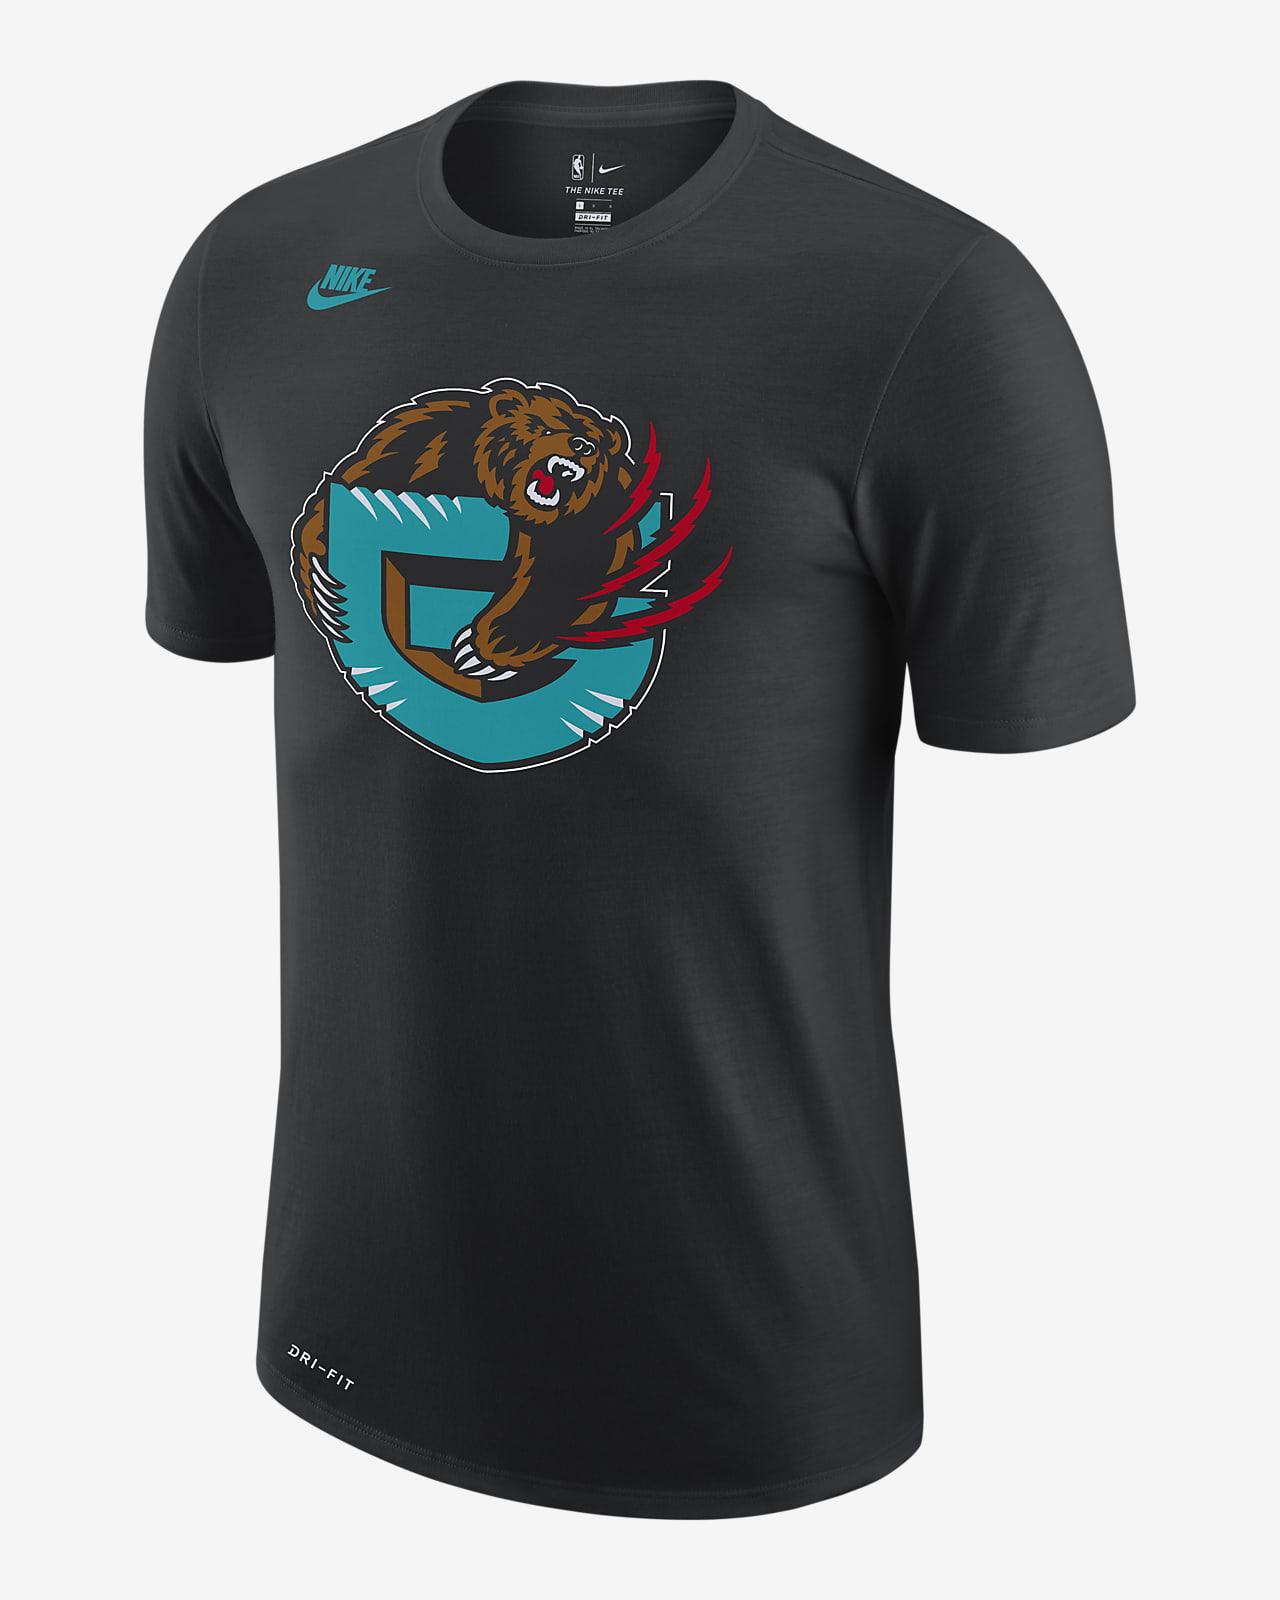 Memphis Grizzlies Classic Edition Logo Men's Nike Dri-FIT NBA T-Shirt